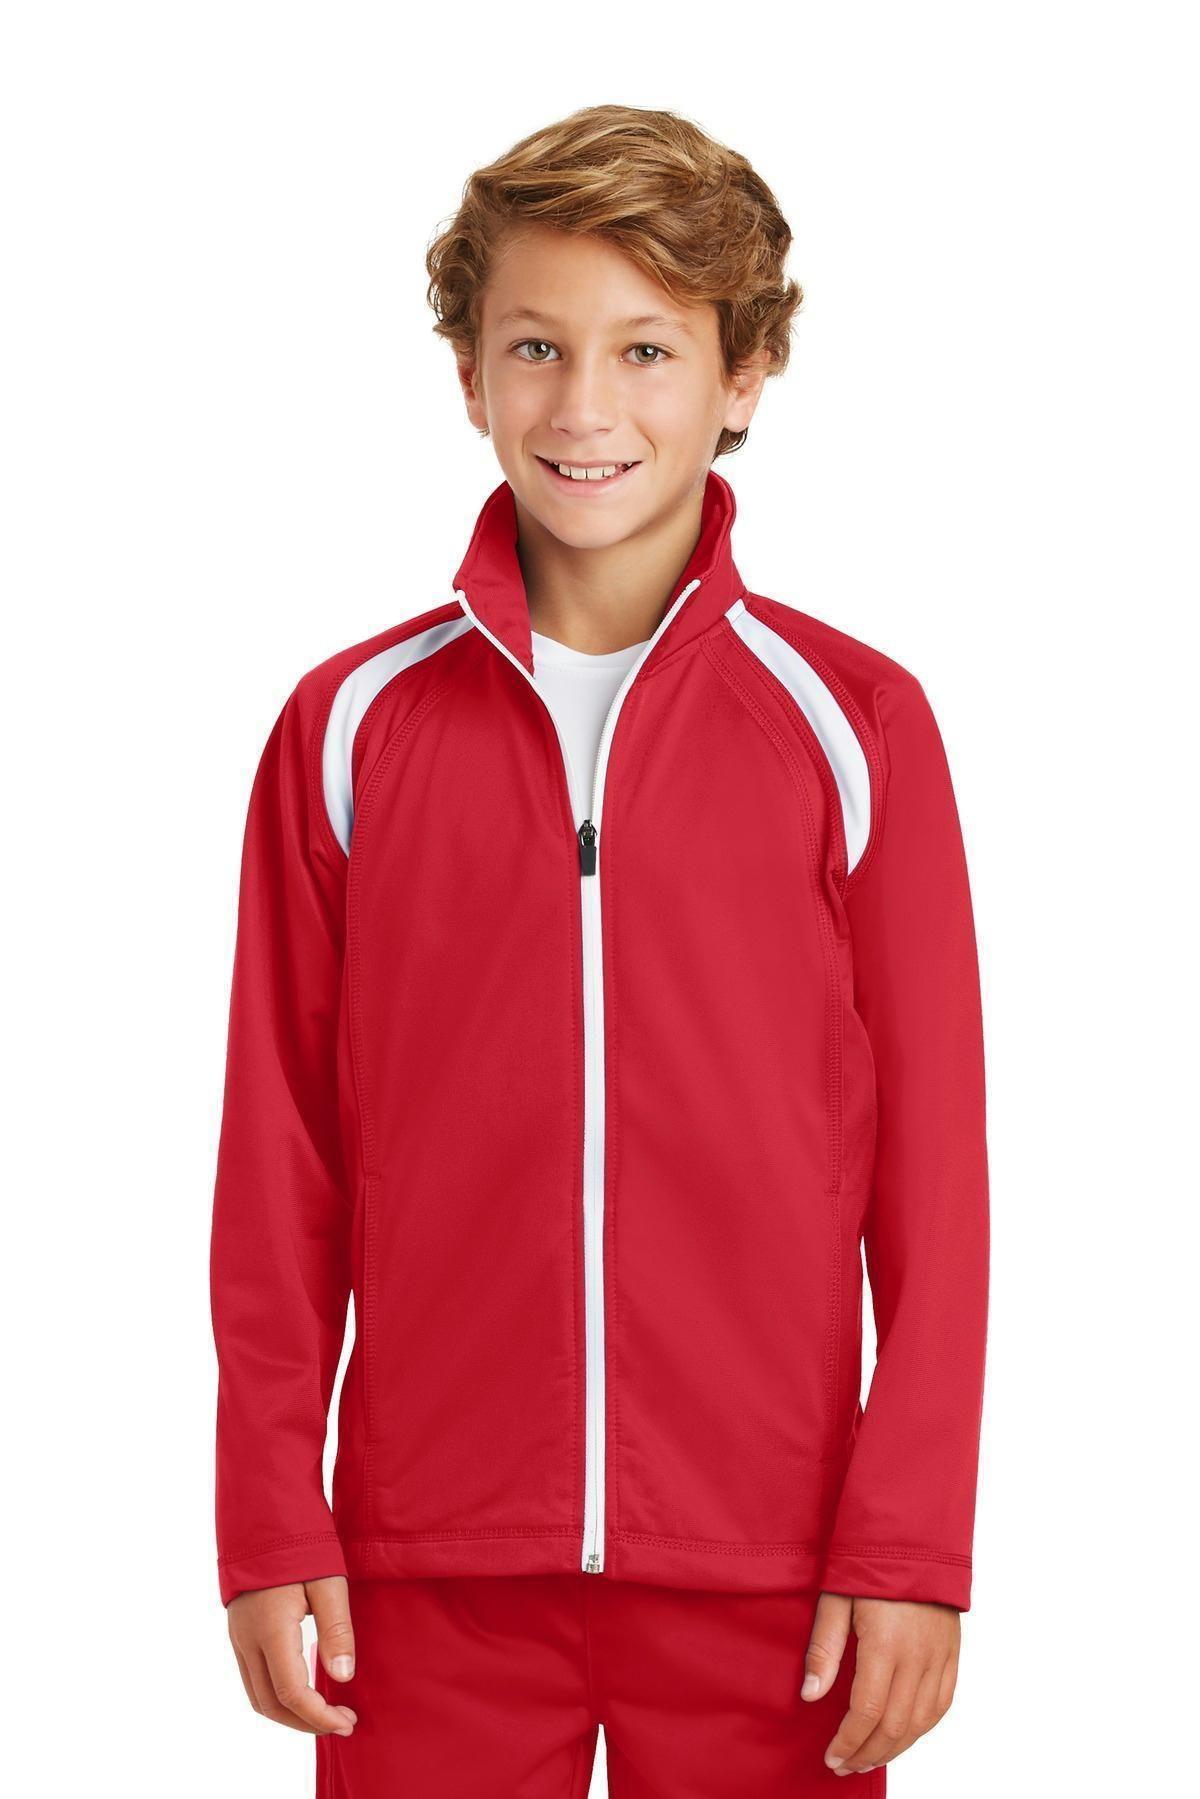 SportTek Youth Tricot Track Jacket. YST90 Jackets, Fall